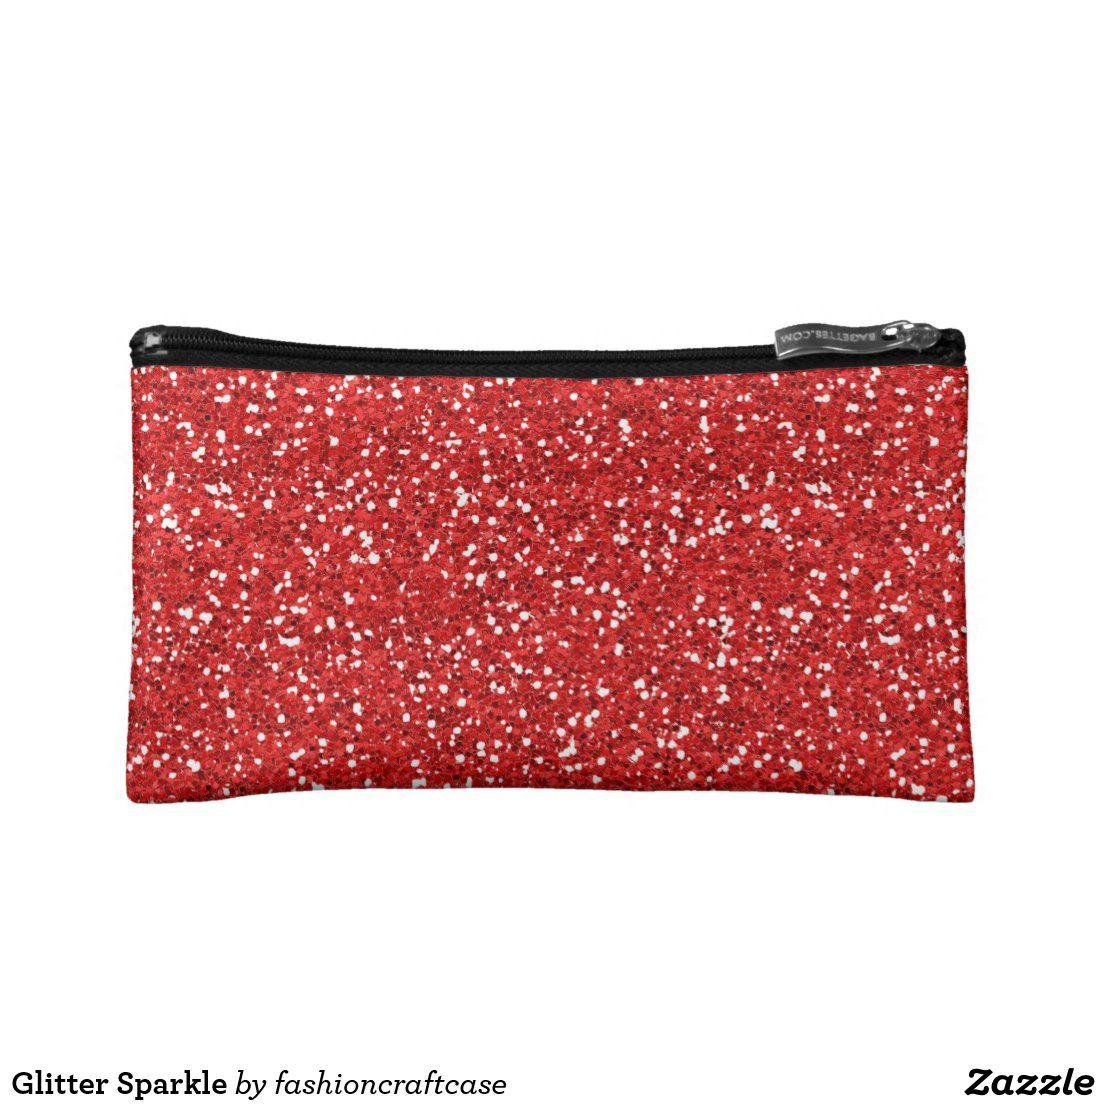 Glitter Sparkle Makeup Bag Zazzle Com In 2020 Sparkle Makeup